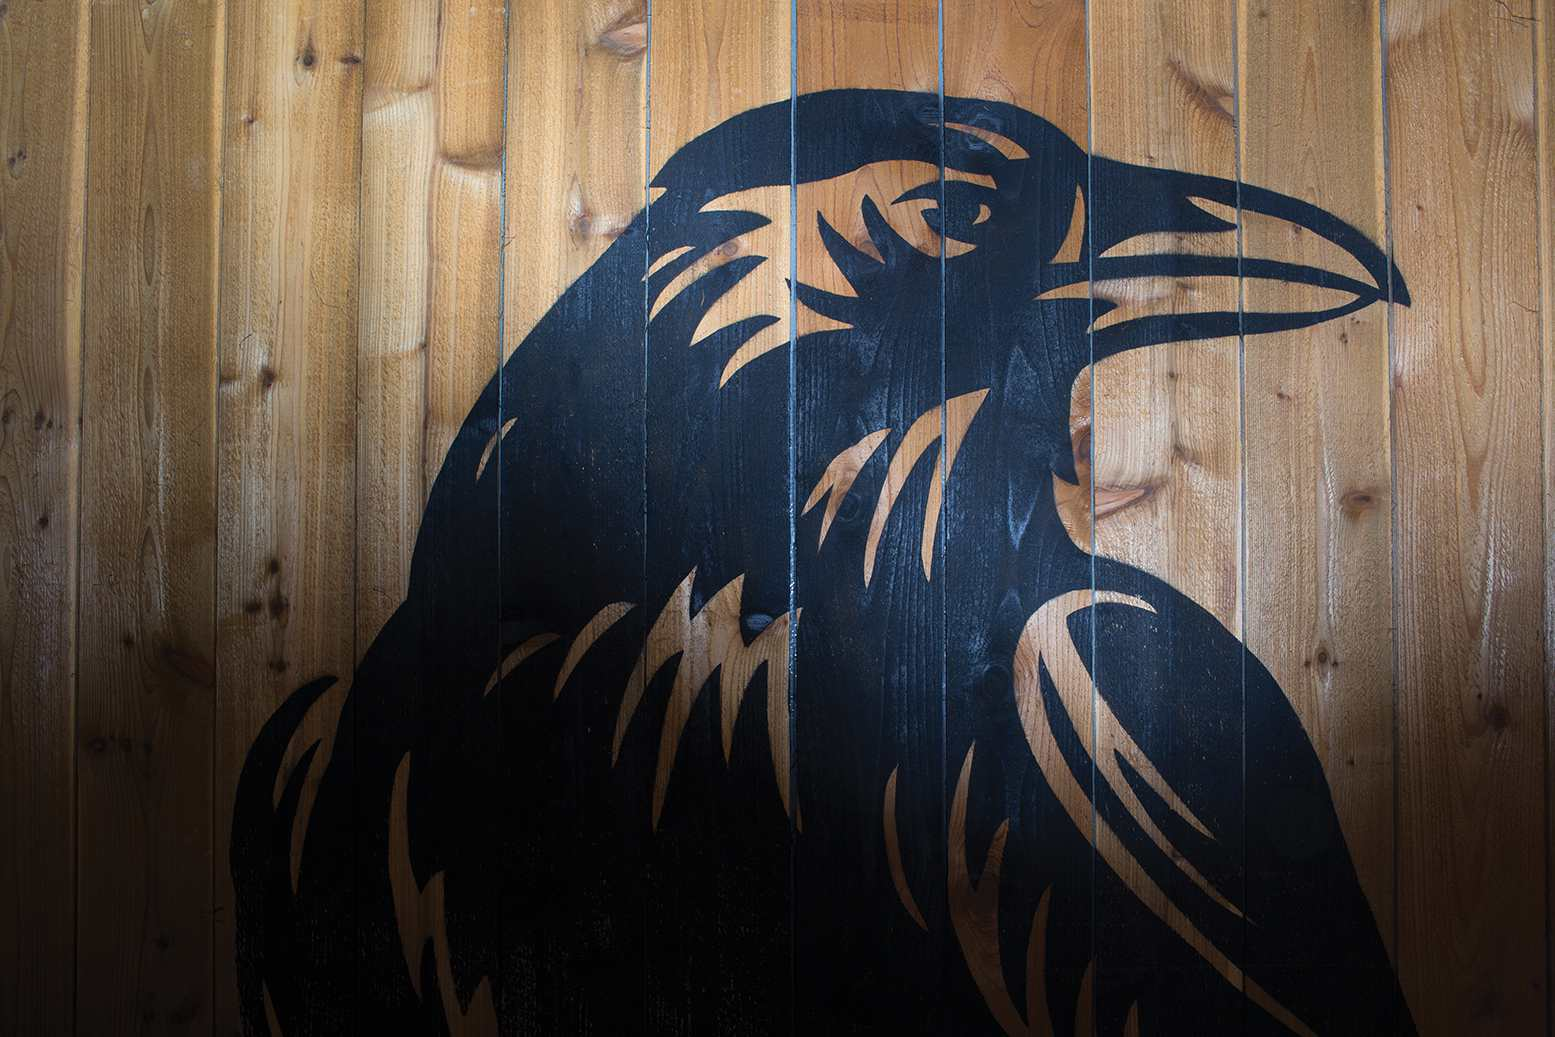 Black Raven Brewery